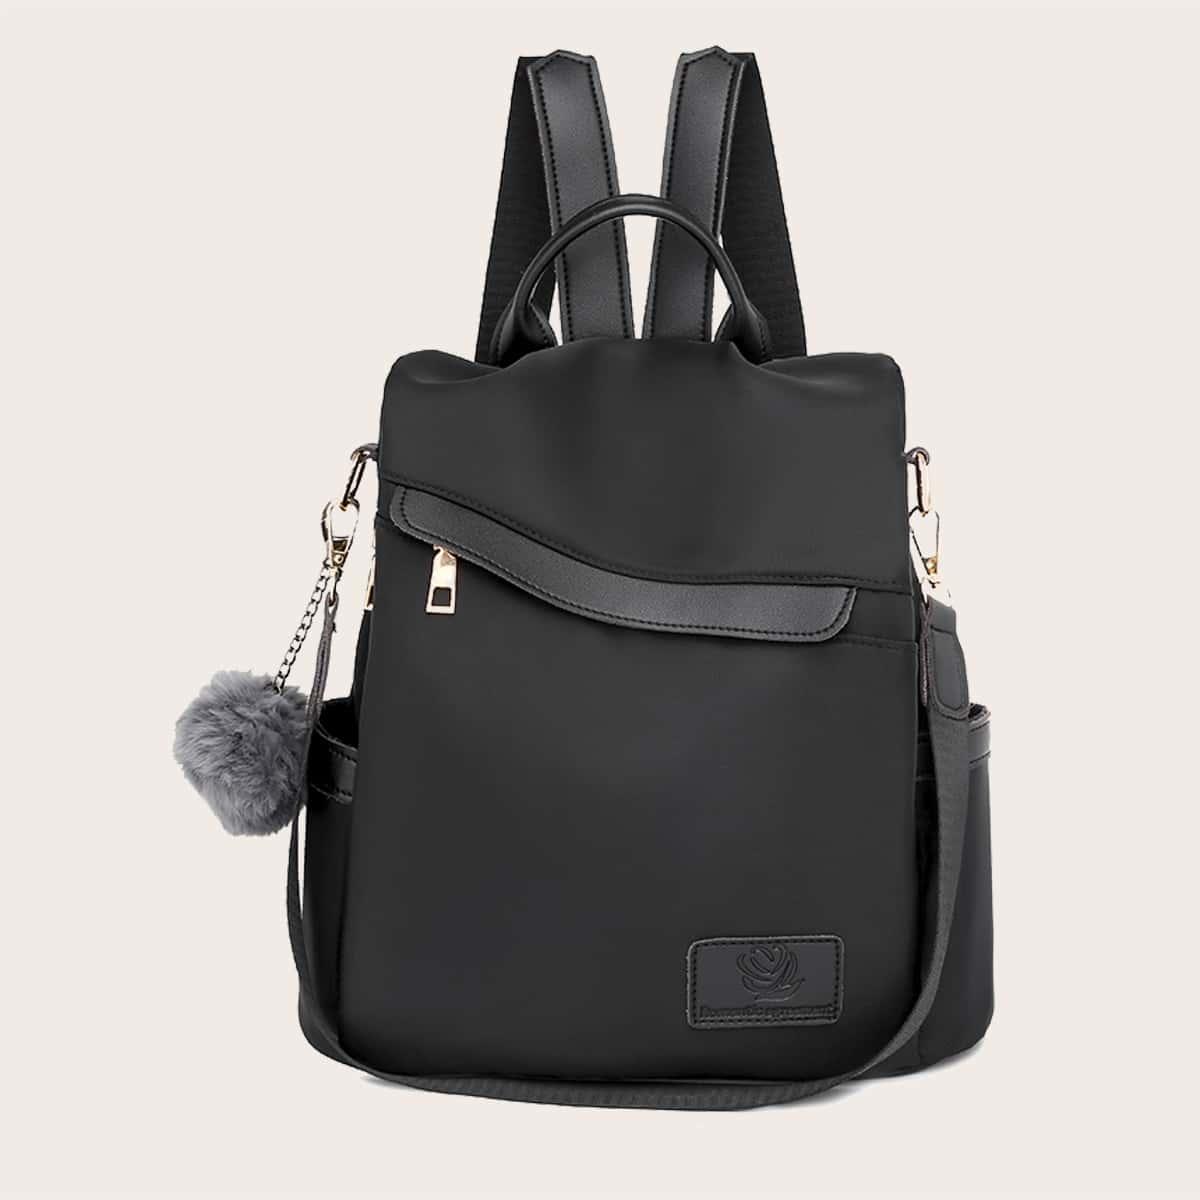 Рюкзак с помпоном и съемным ремешком